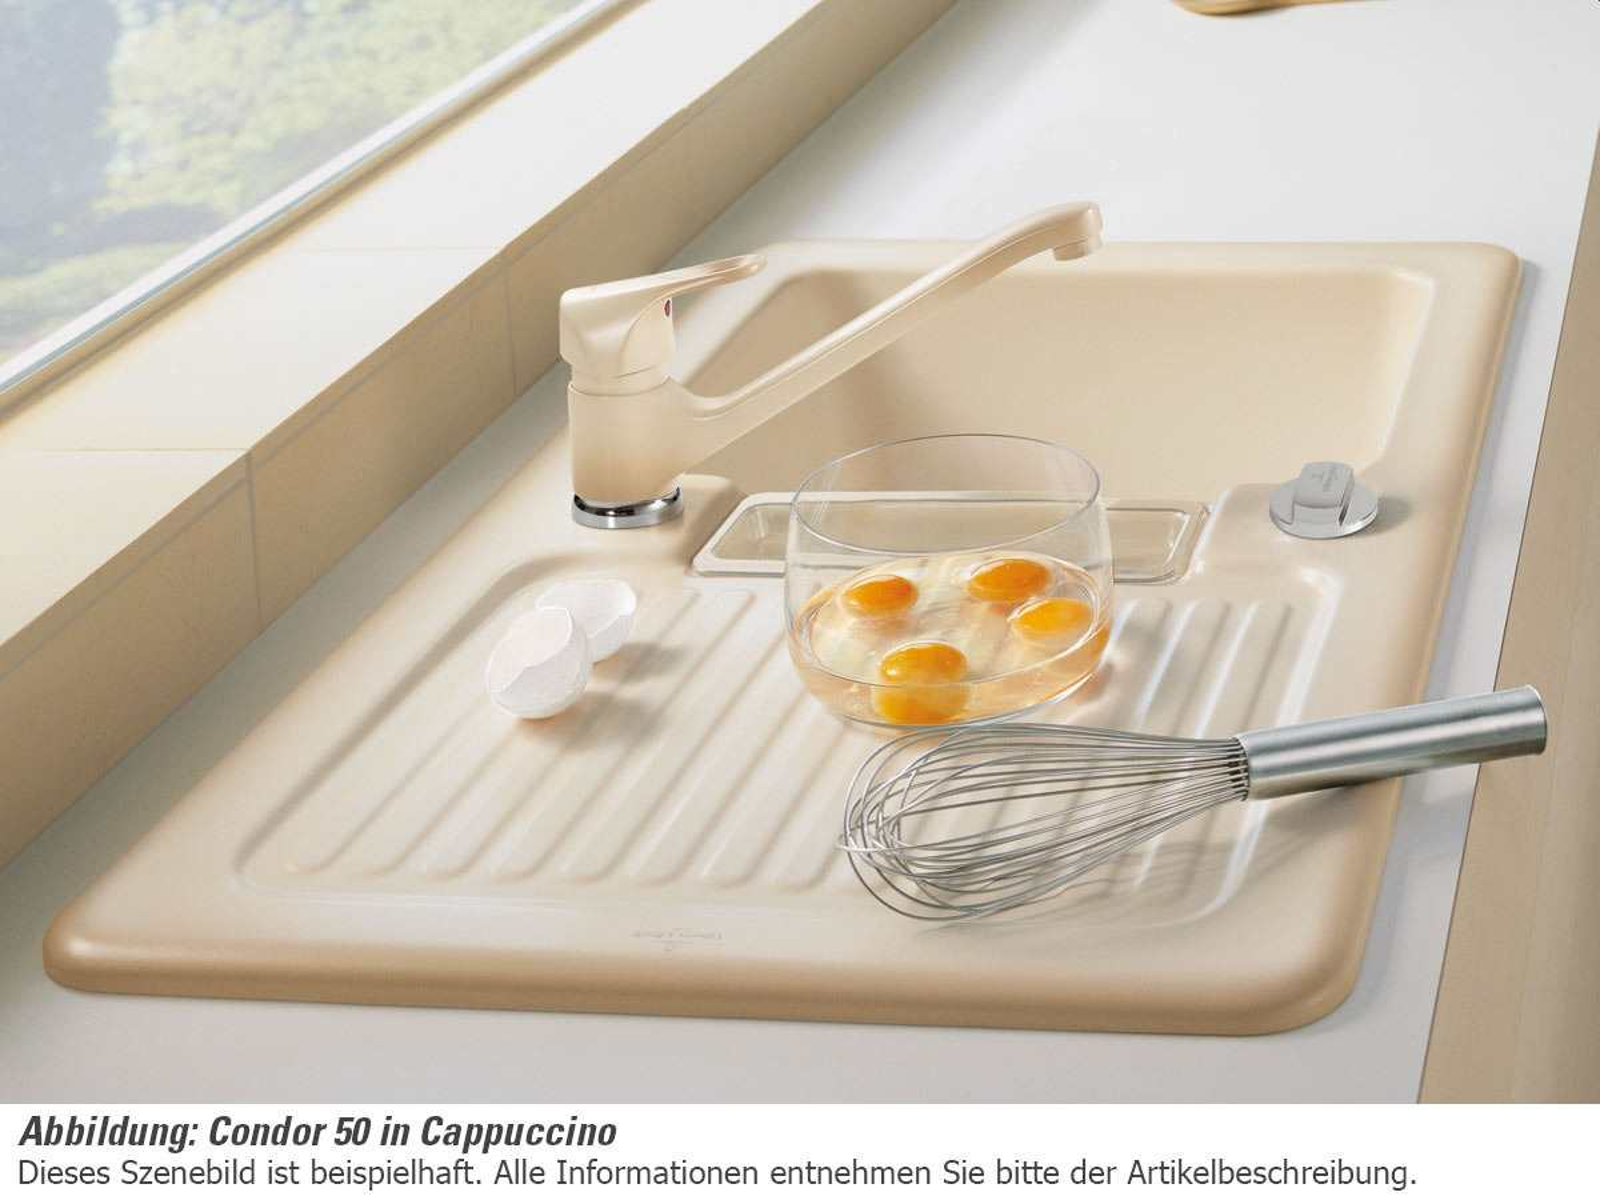 Villeroy & Boch Condor 50 Chromit - 6732 02 J0 Keramikspüle Exzenterbetätigung